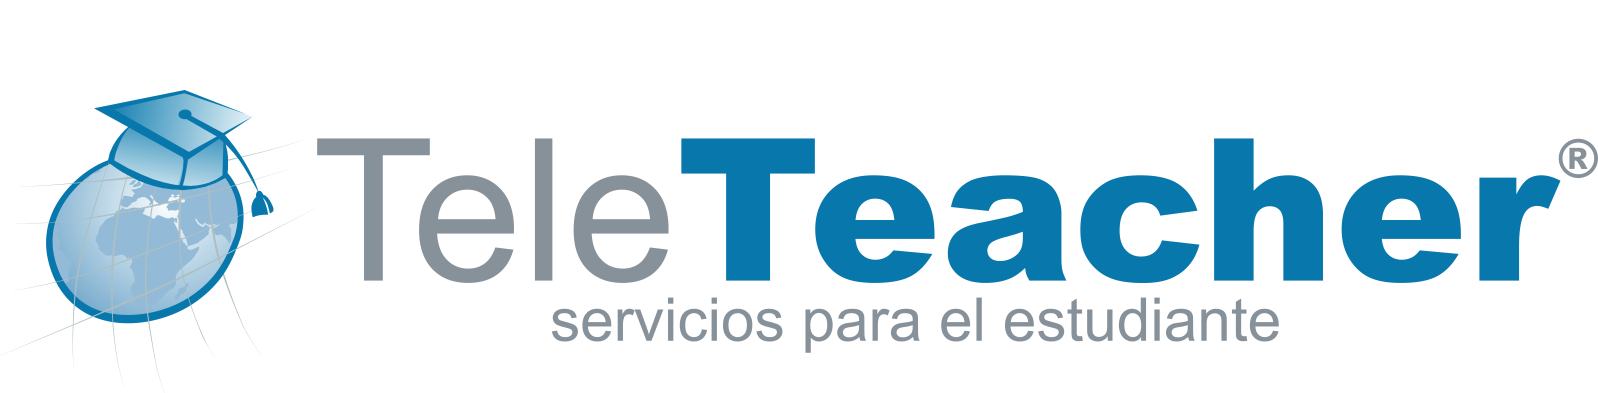 TeleTeacher